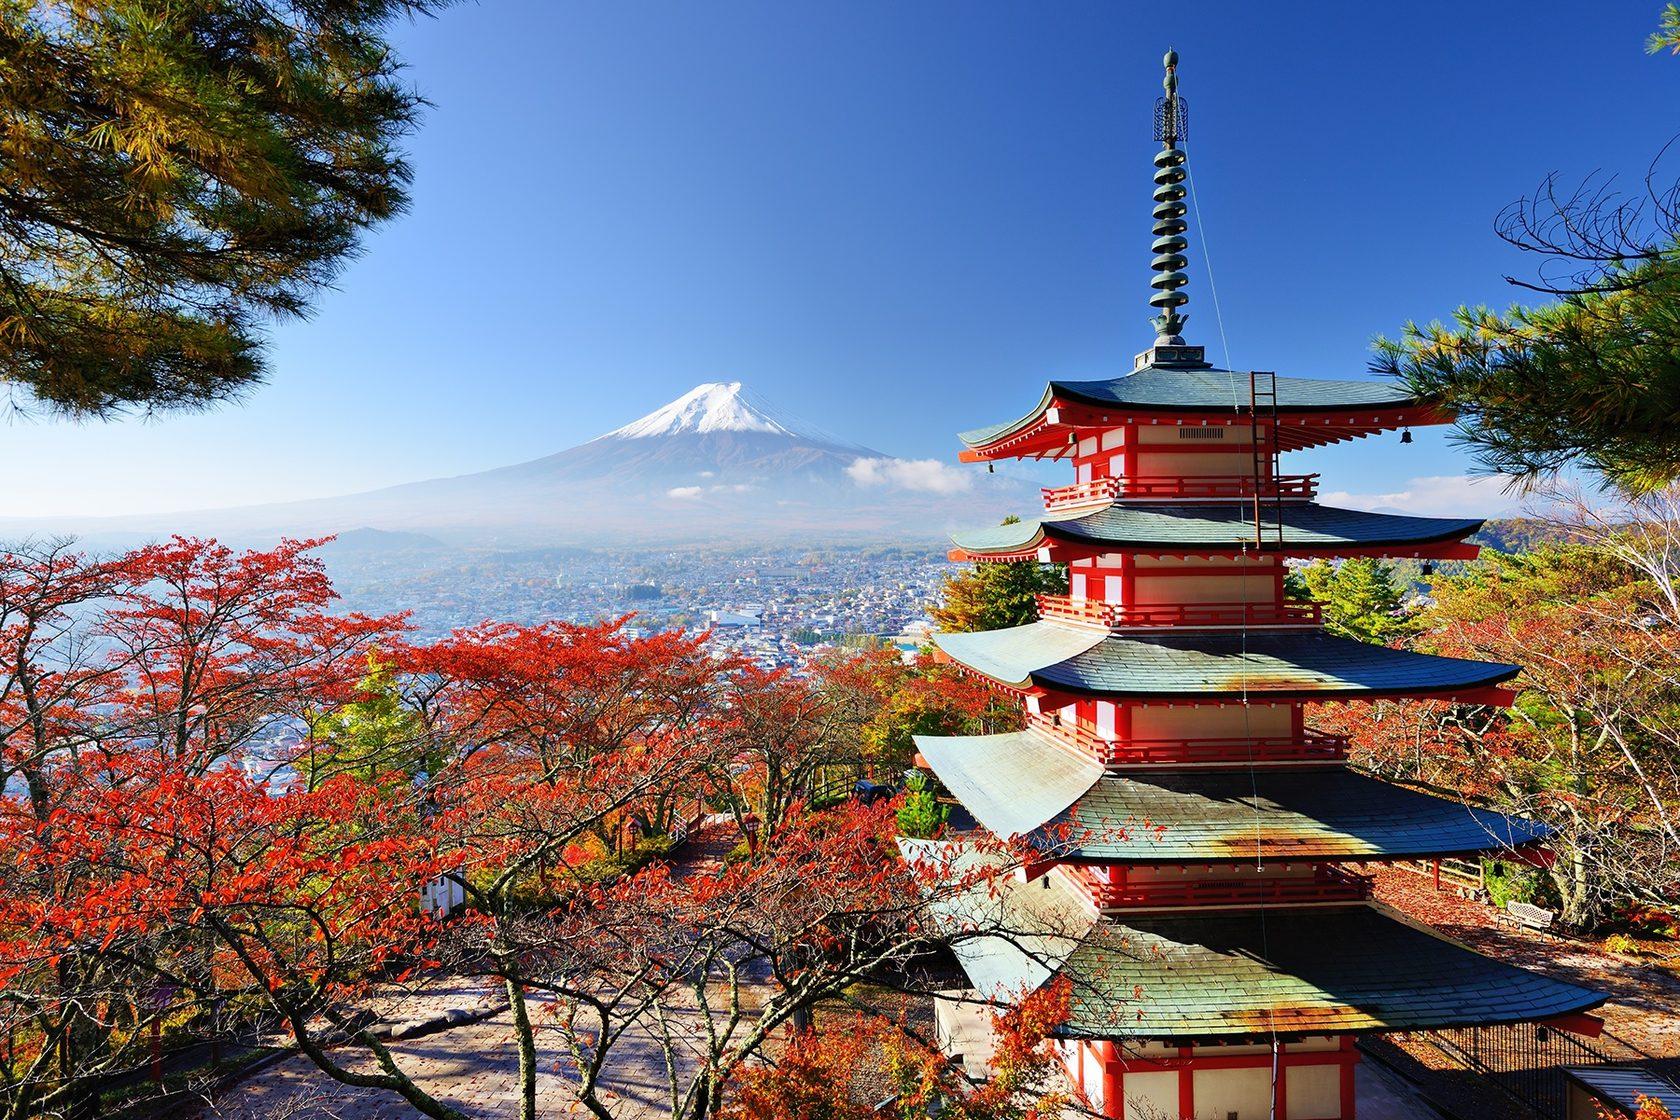 фото японских пейзажей имеют связи многих